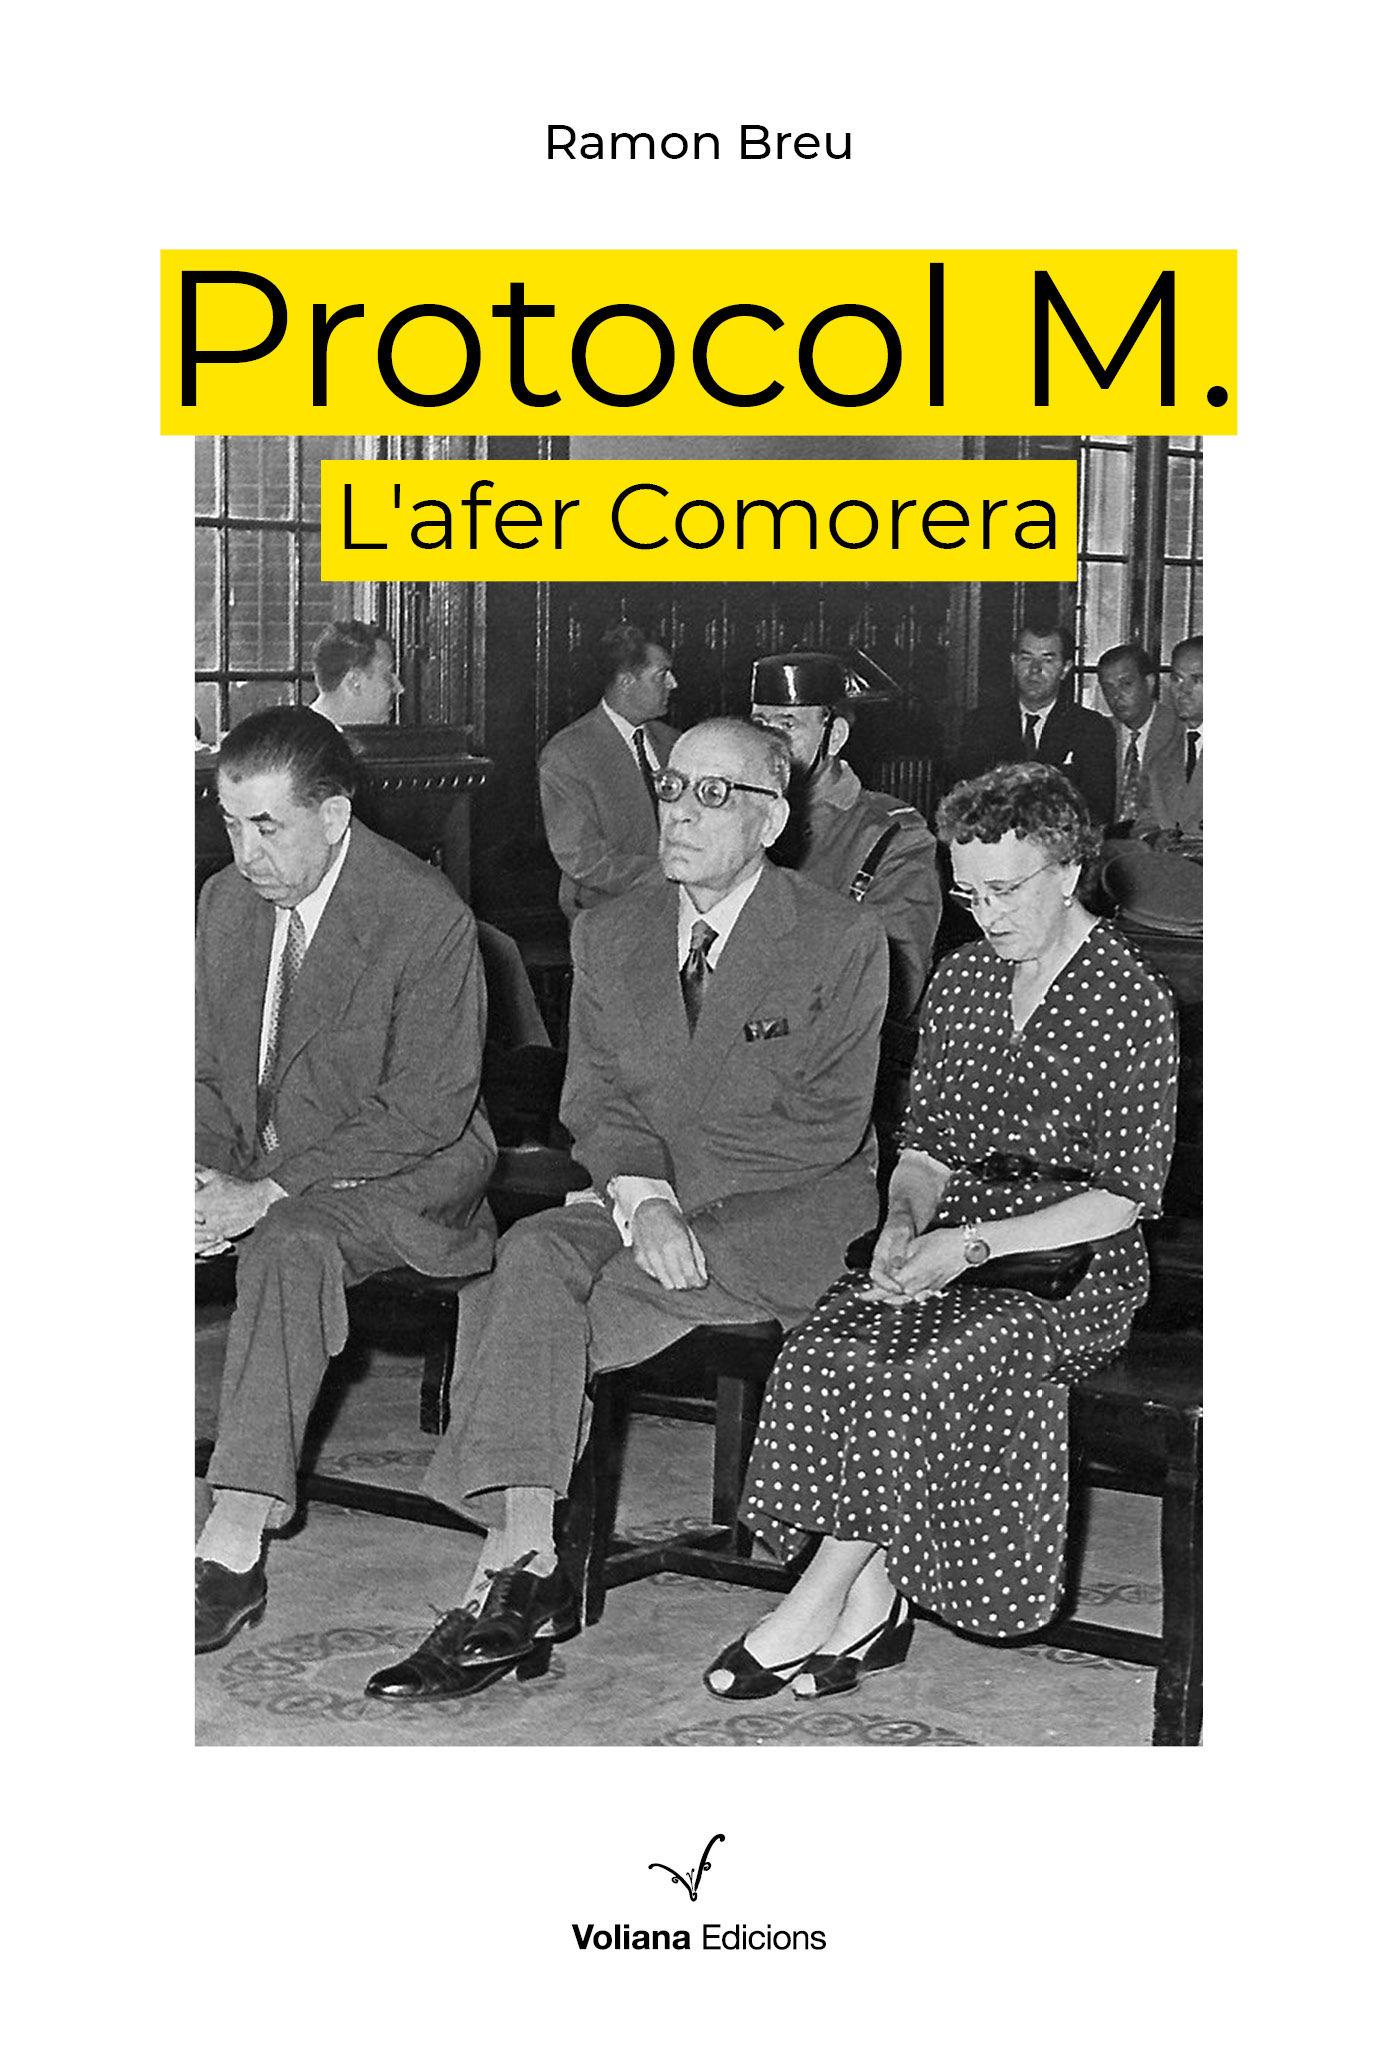 PROTOCOL M. L'AFER COMORERA